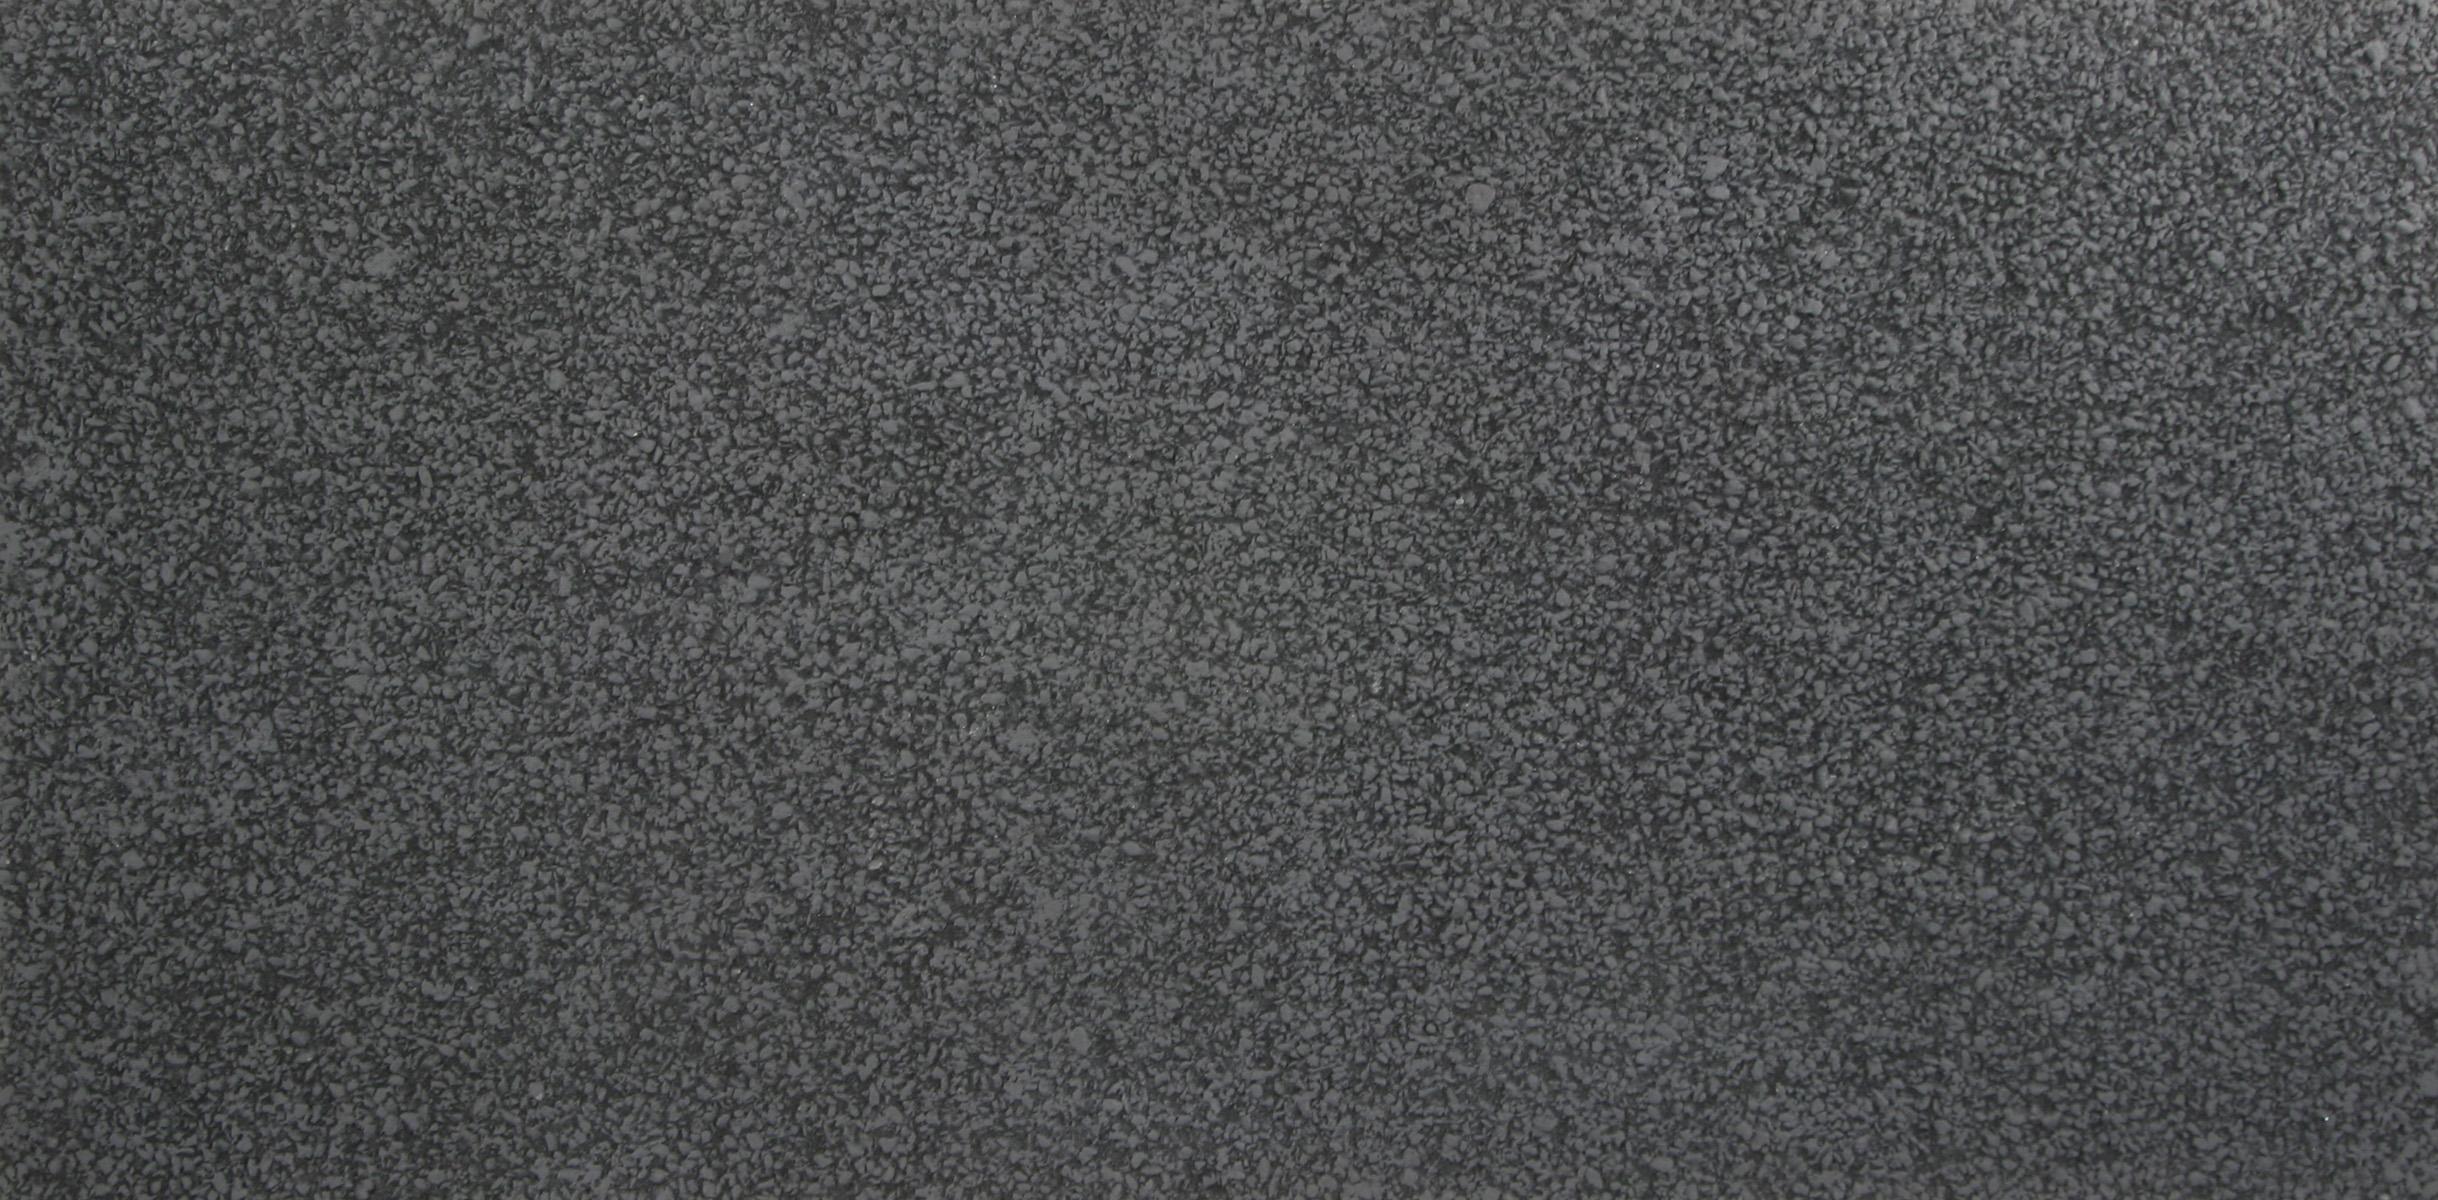 texture asphalt, texture road, asphalt texture background ...